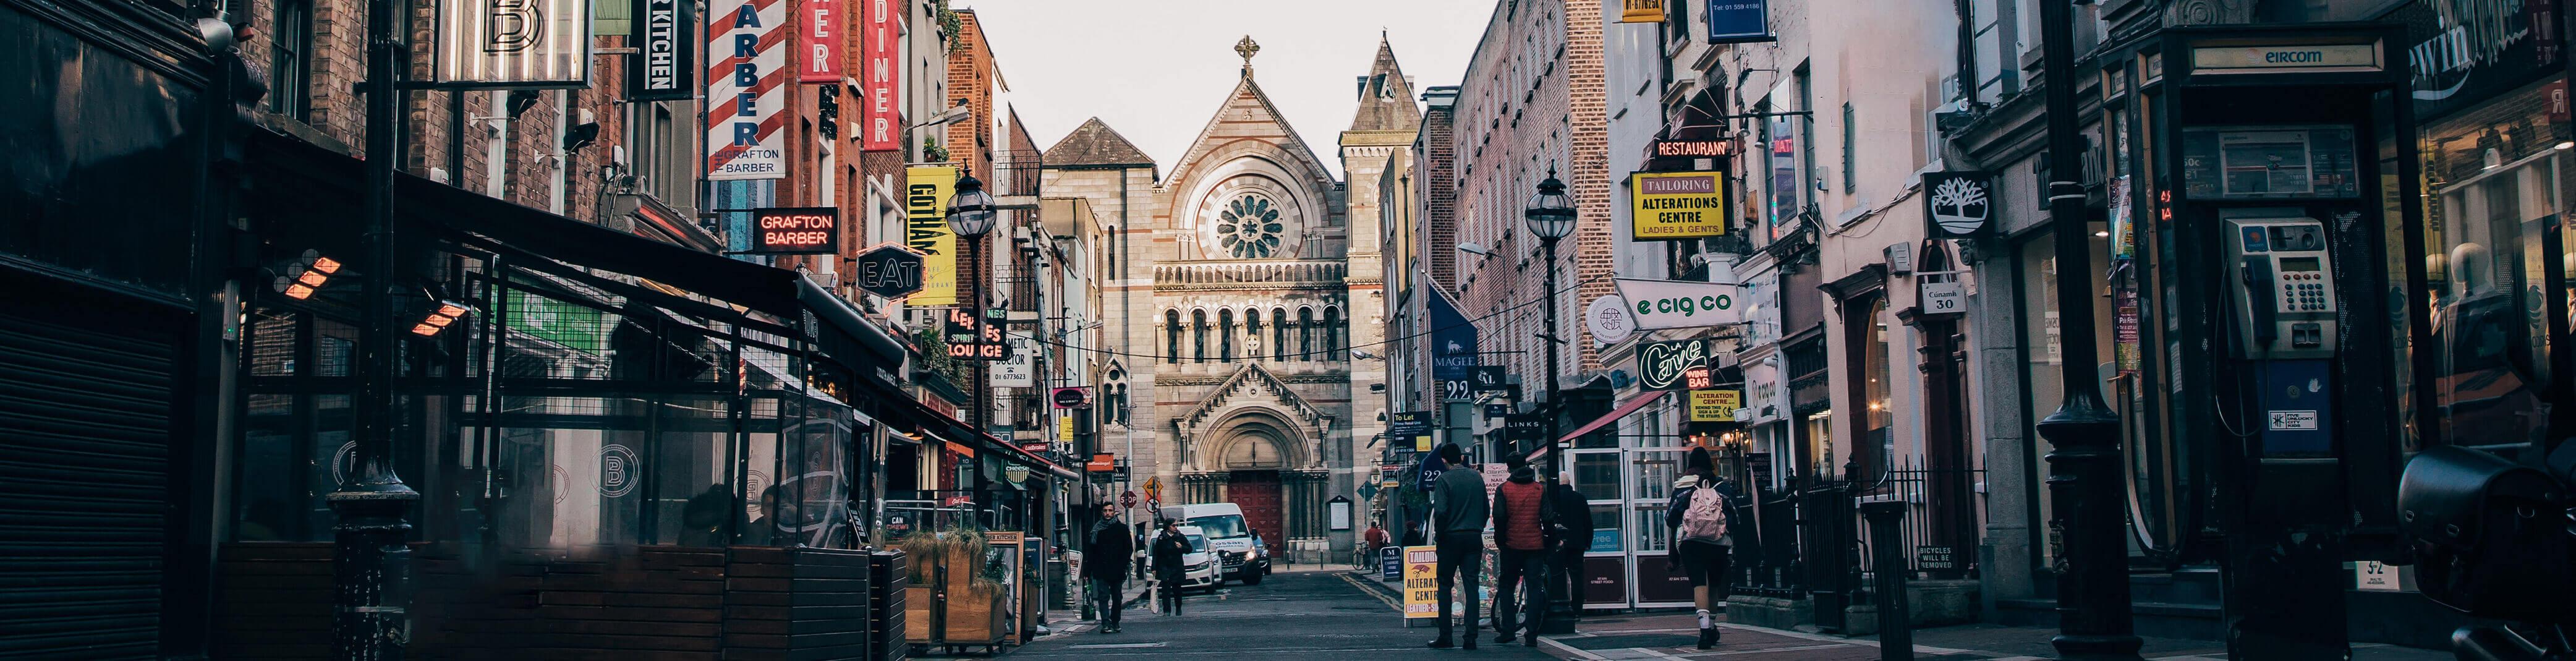 Online Training Courses In Dublin